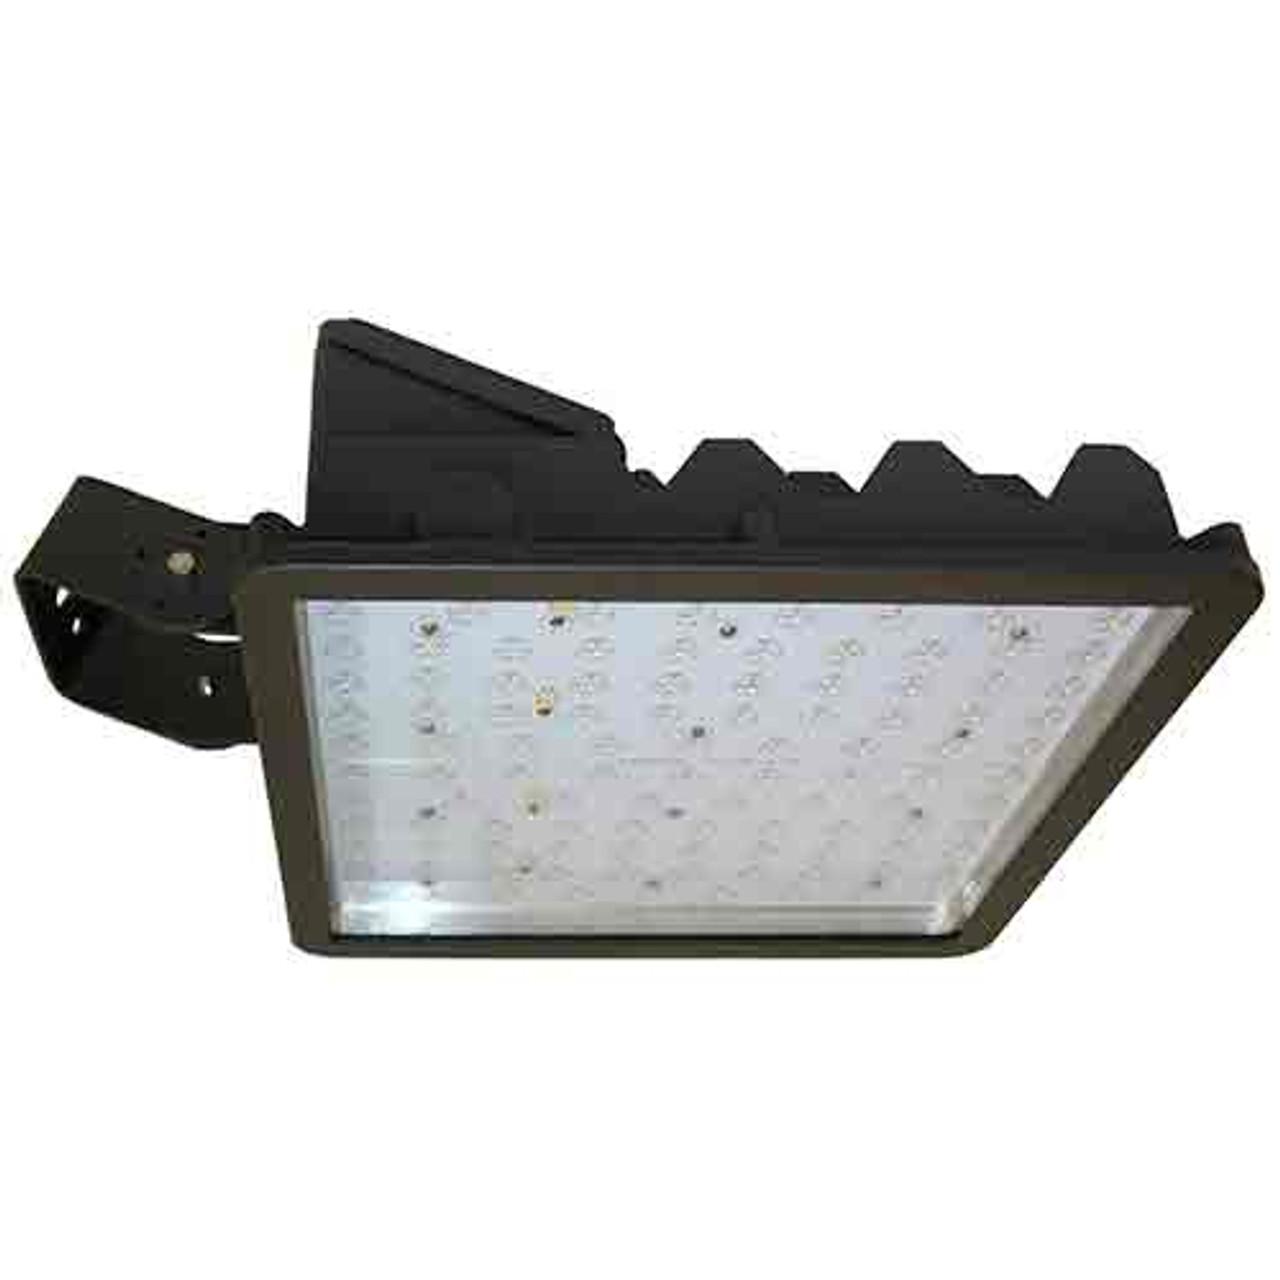 262 Watt LED Area Light 26,264 Lumens with bracket mount